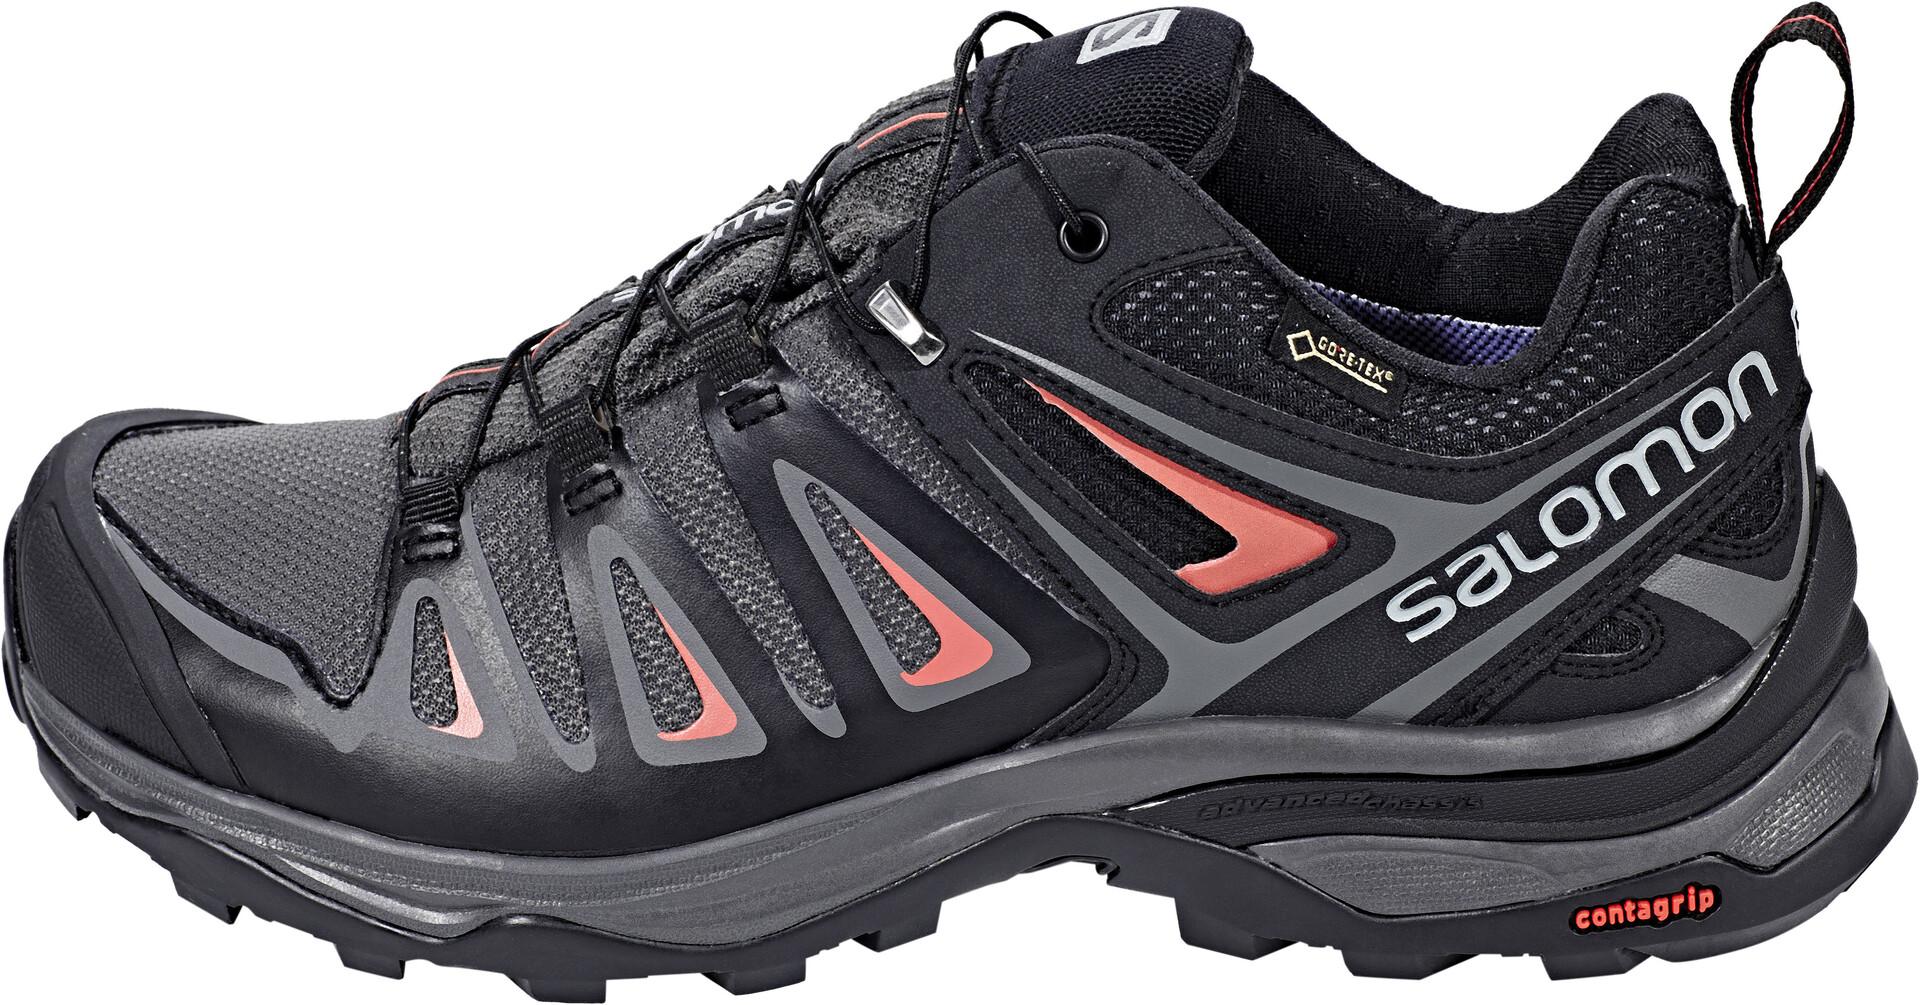 Salomon X Ultra 3 GTX Hiking Shoes Women magnetblackmineral red